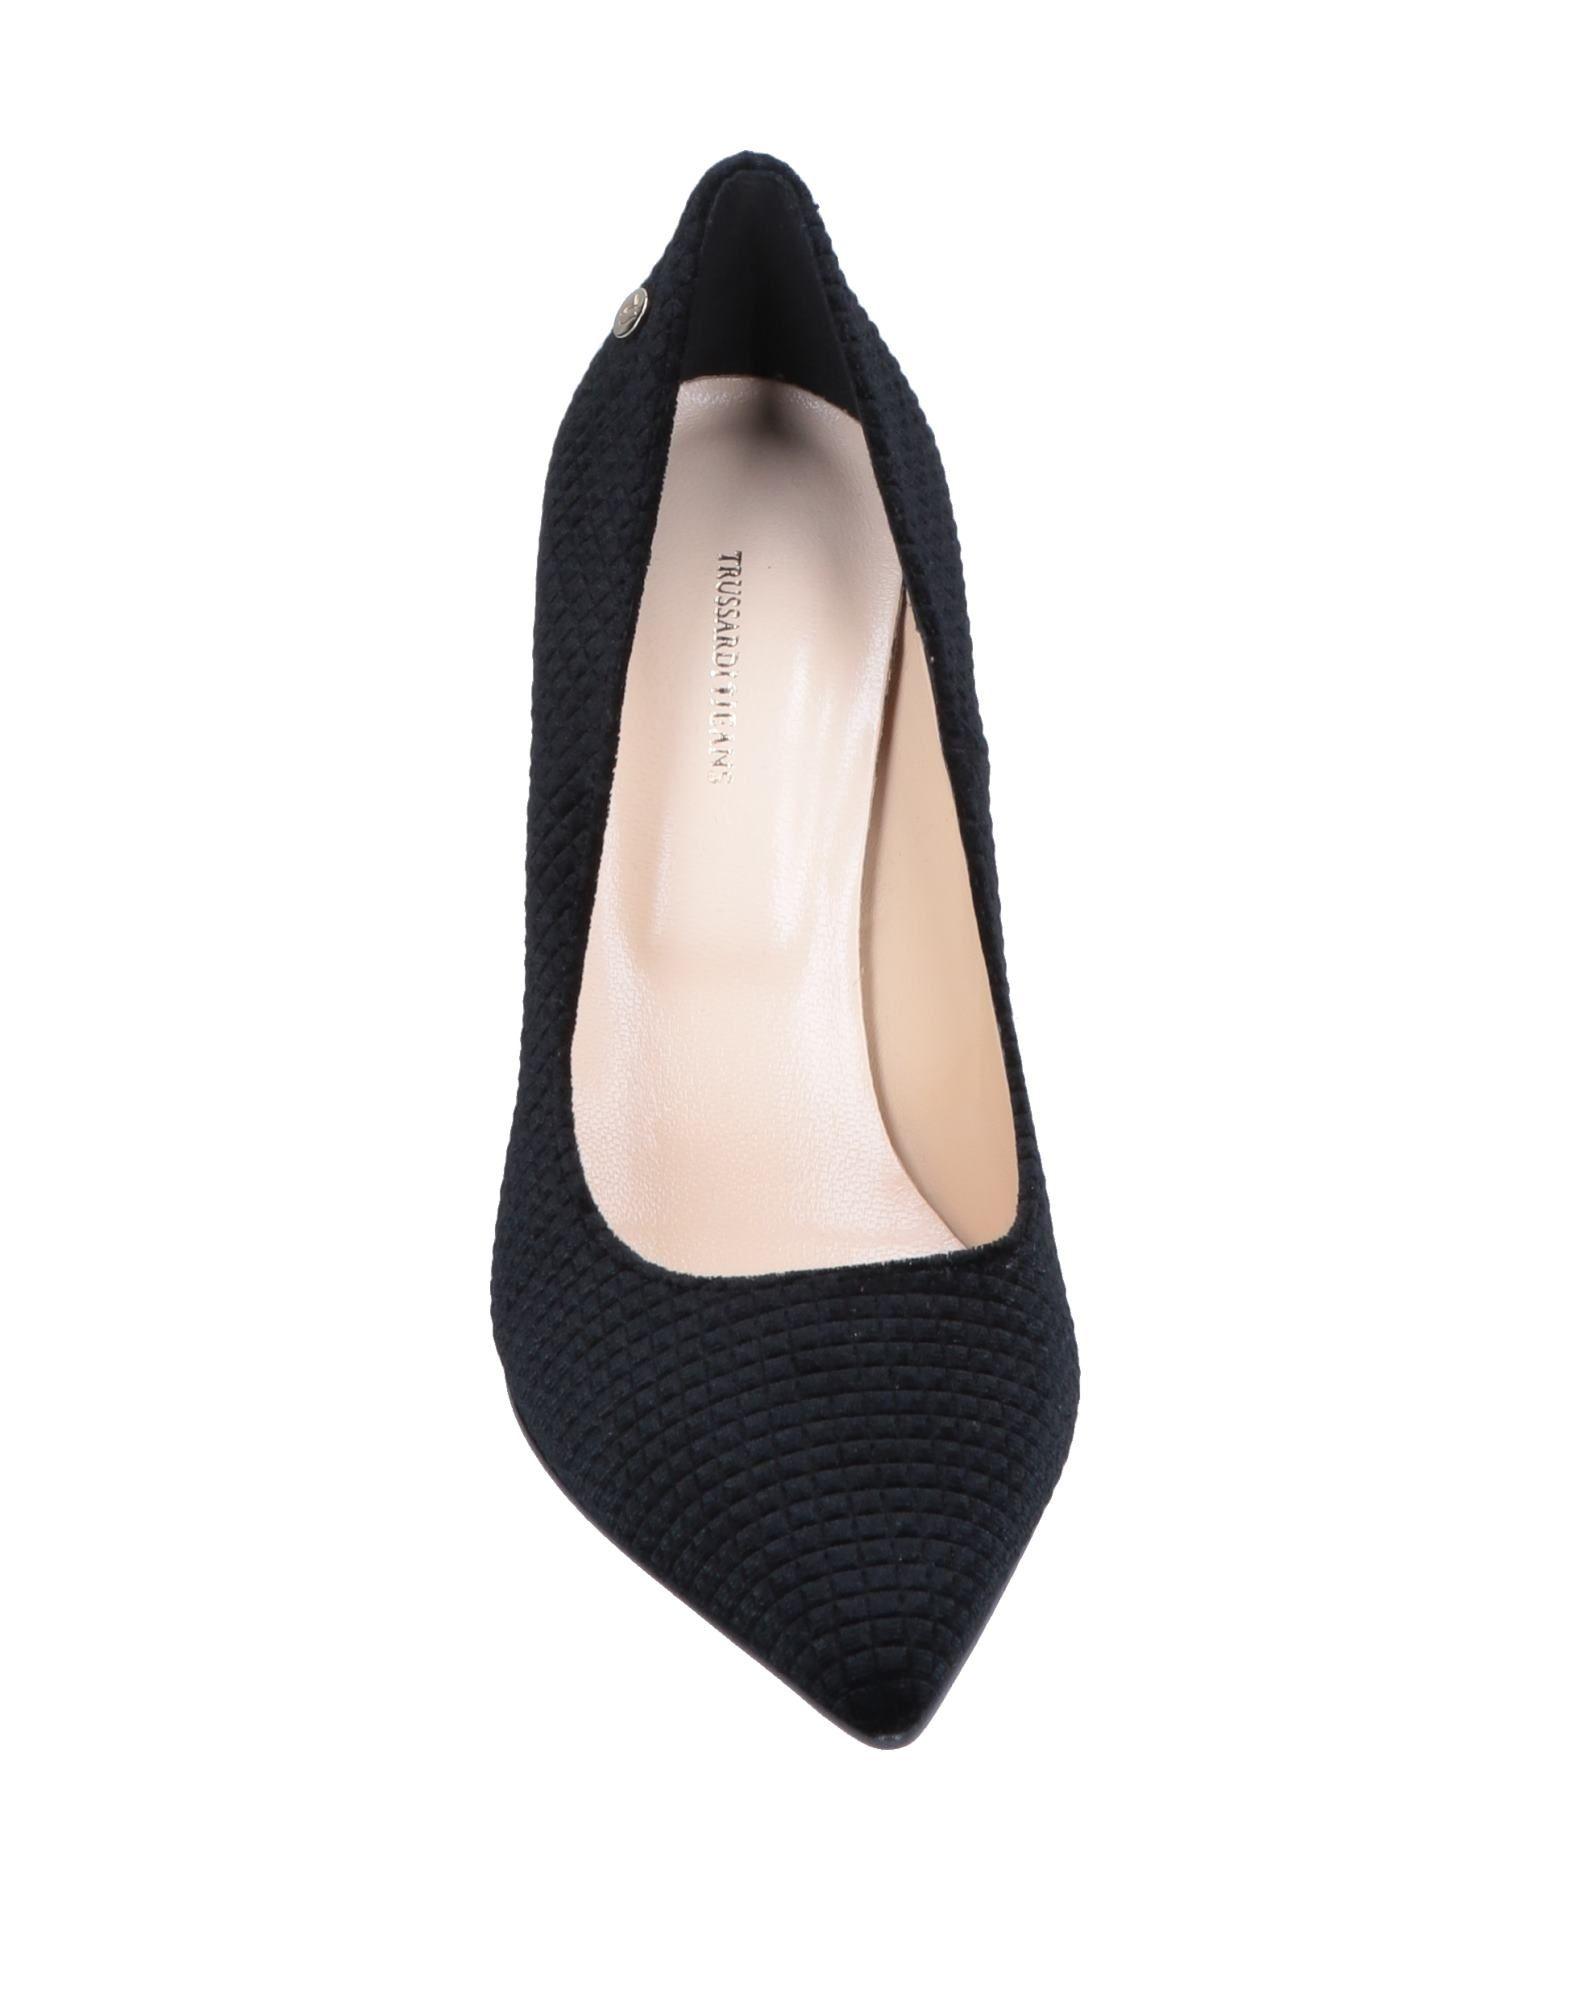 Trussardi Jeans Pumps Qualität Damen  11545917XT Gute Qualität Pumps beliebte Schuhe 3795bc